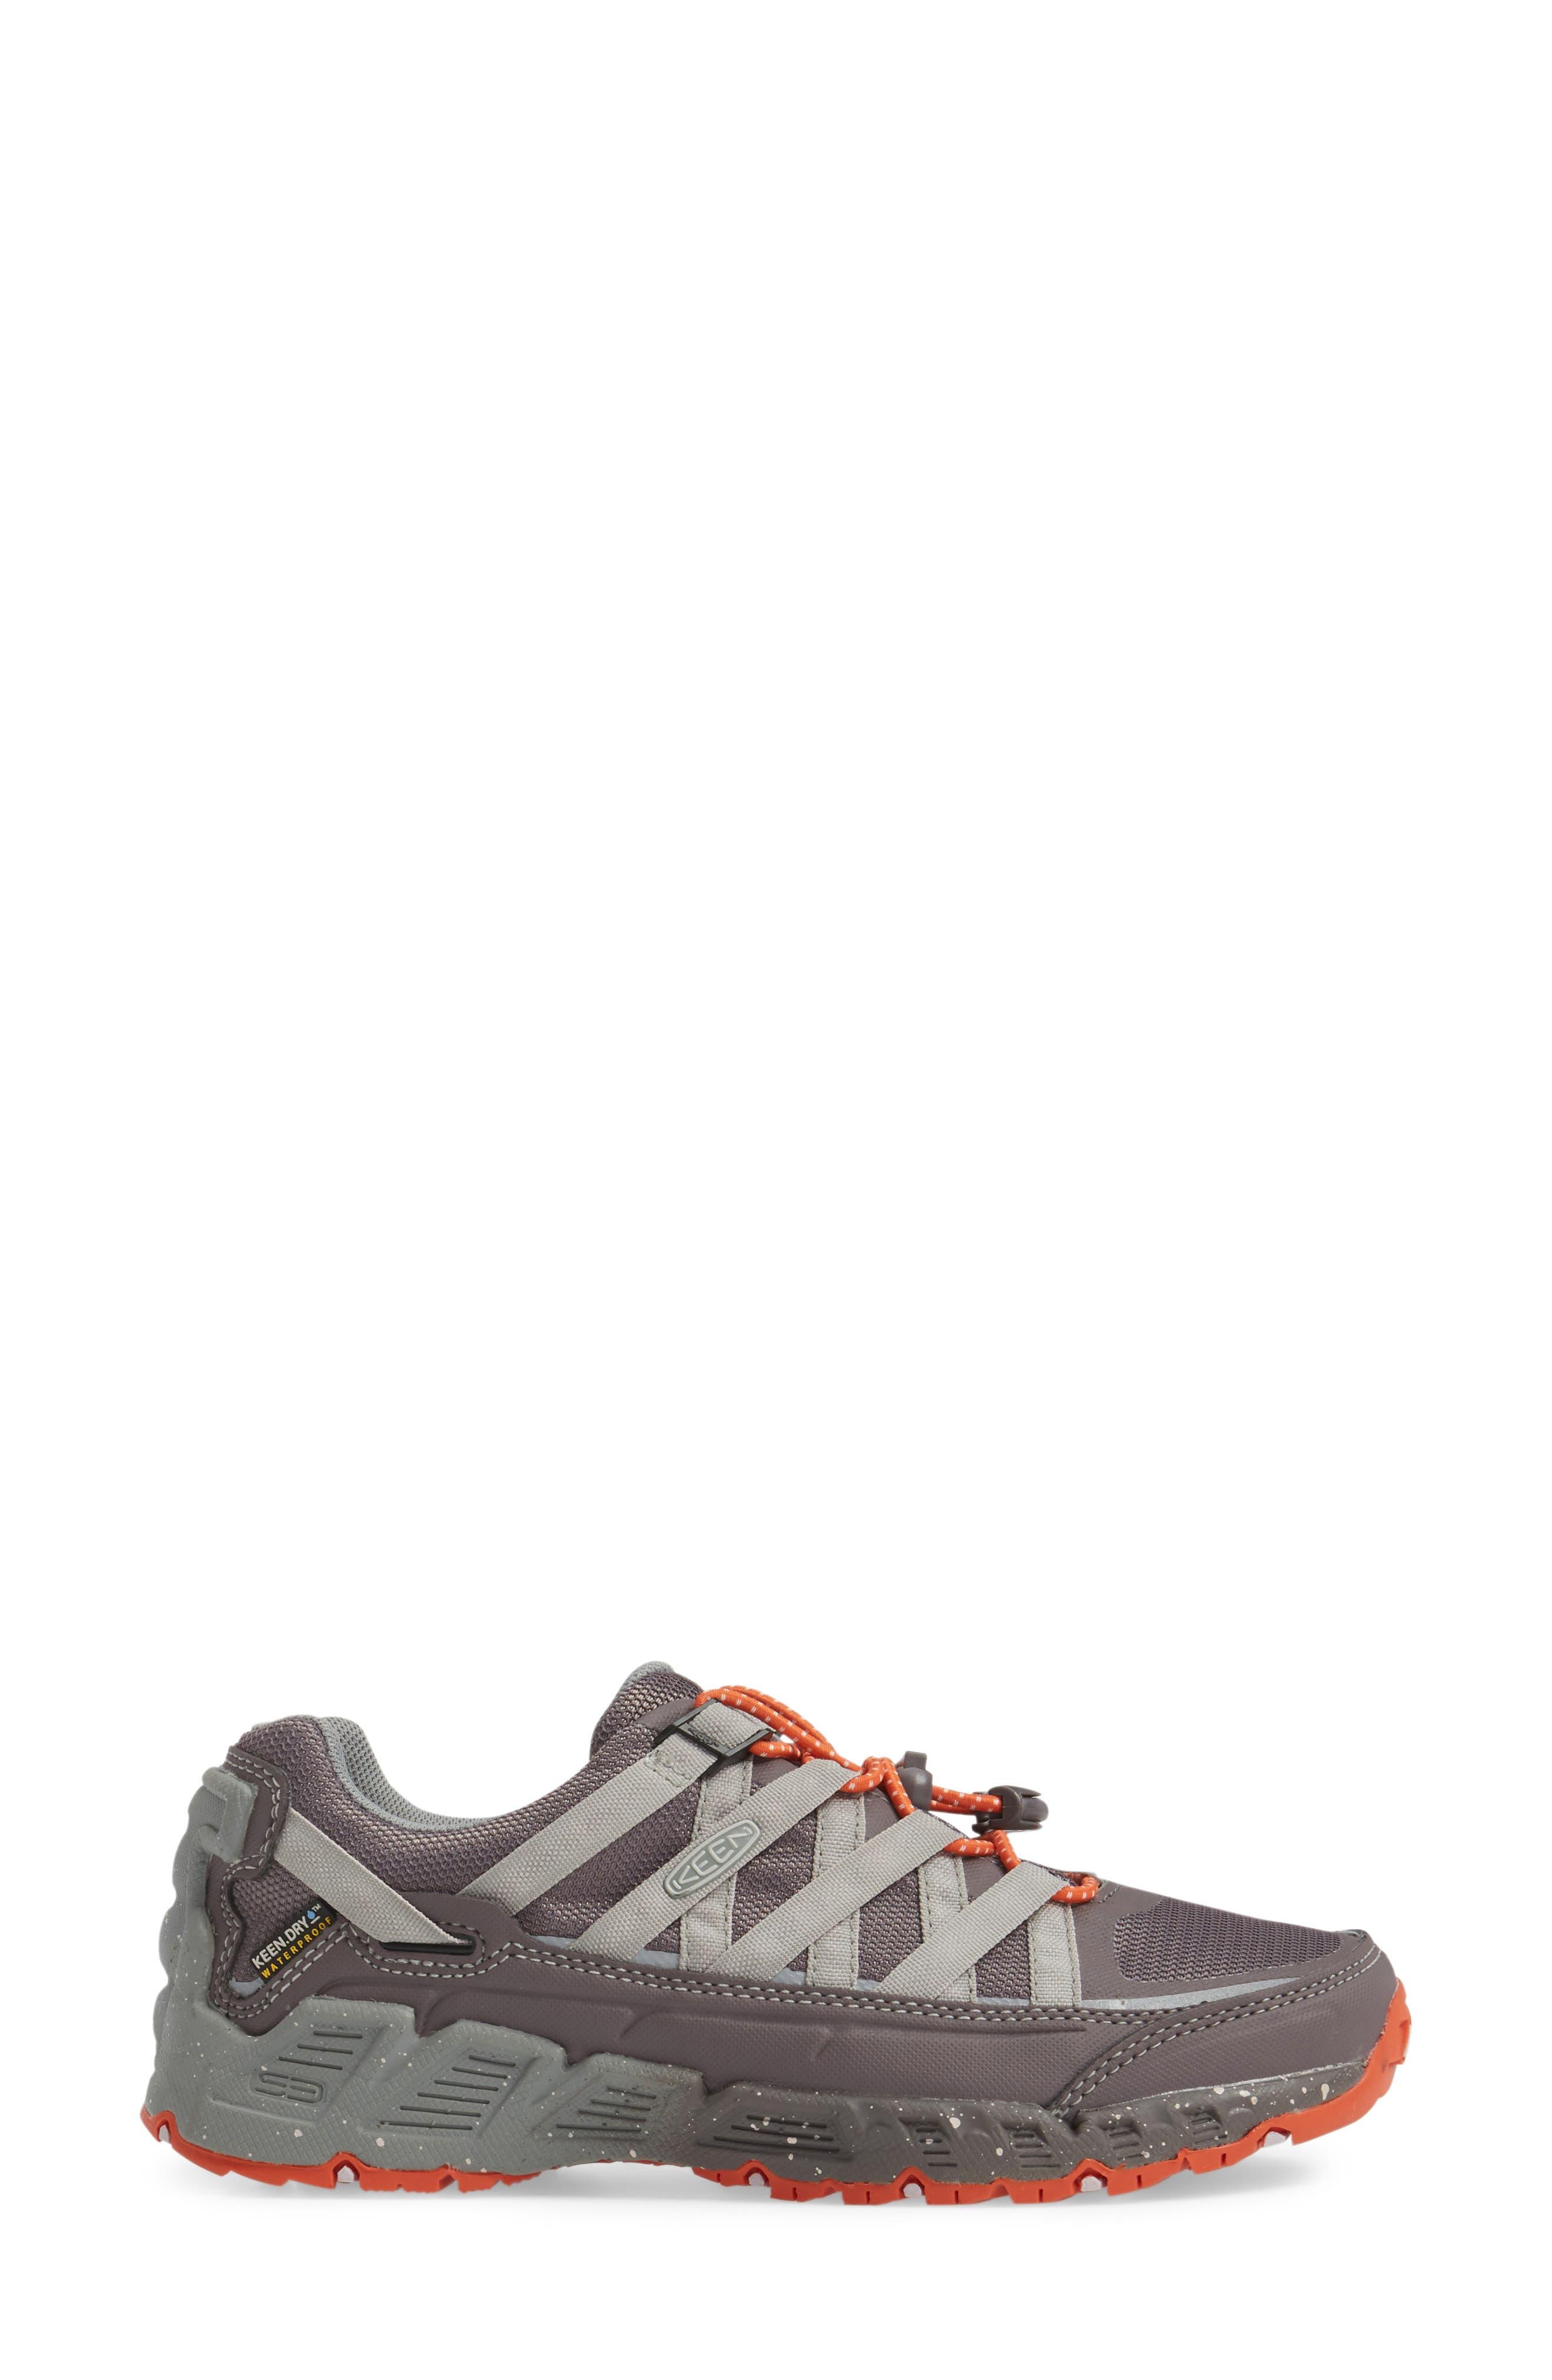 Alternate Image 3  - Keen 'Versatrail' Waterproof Hiking Shoe (Women)